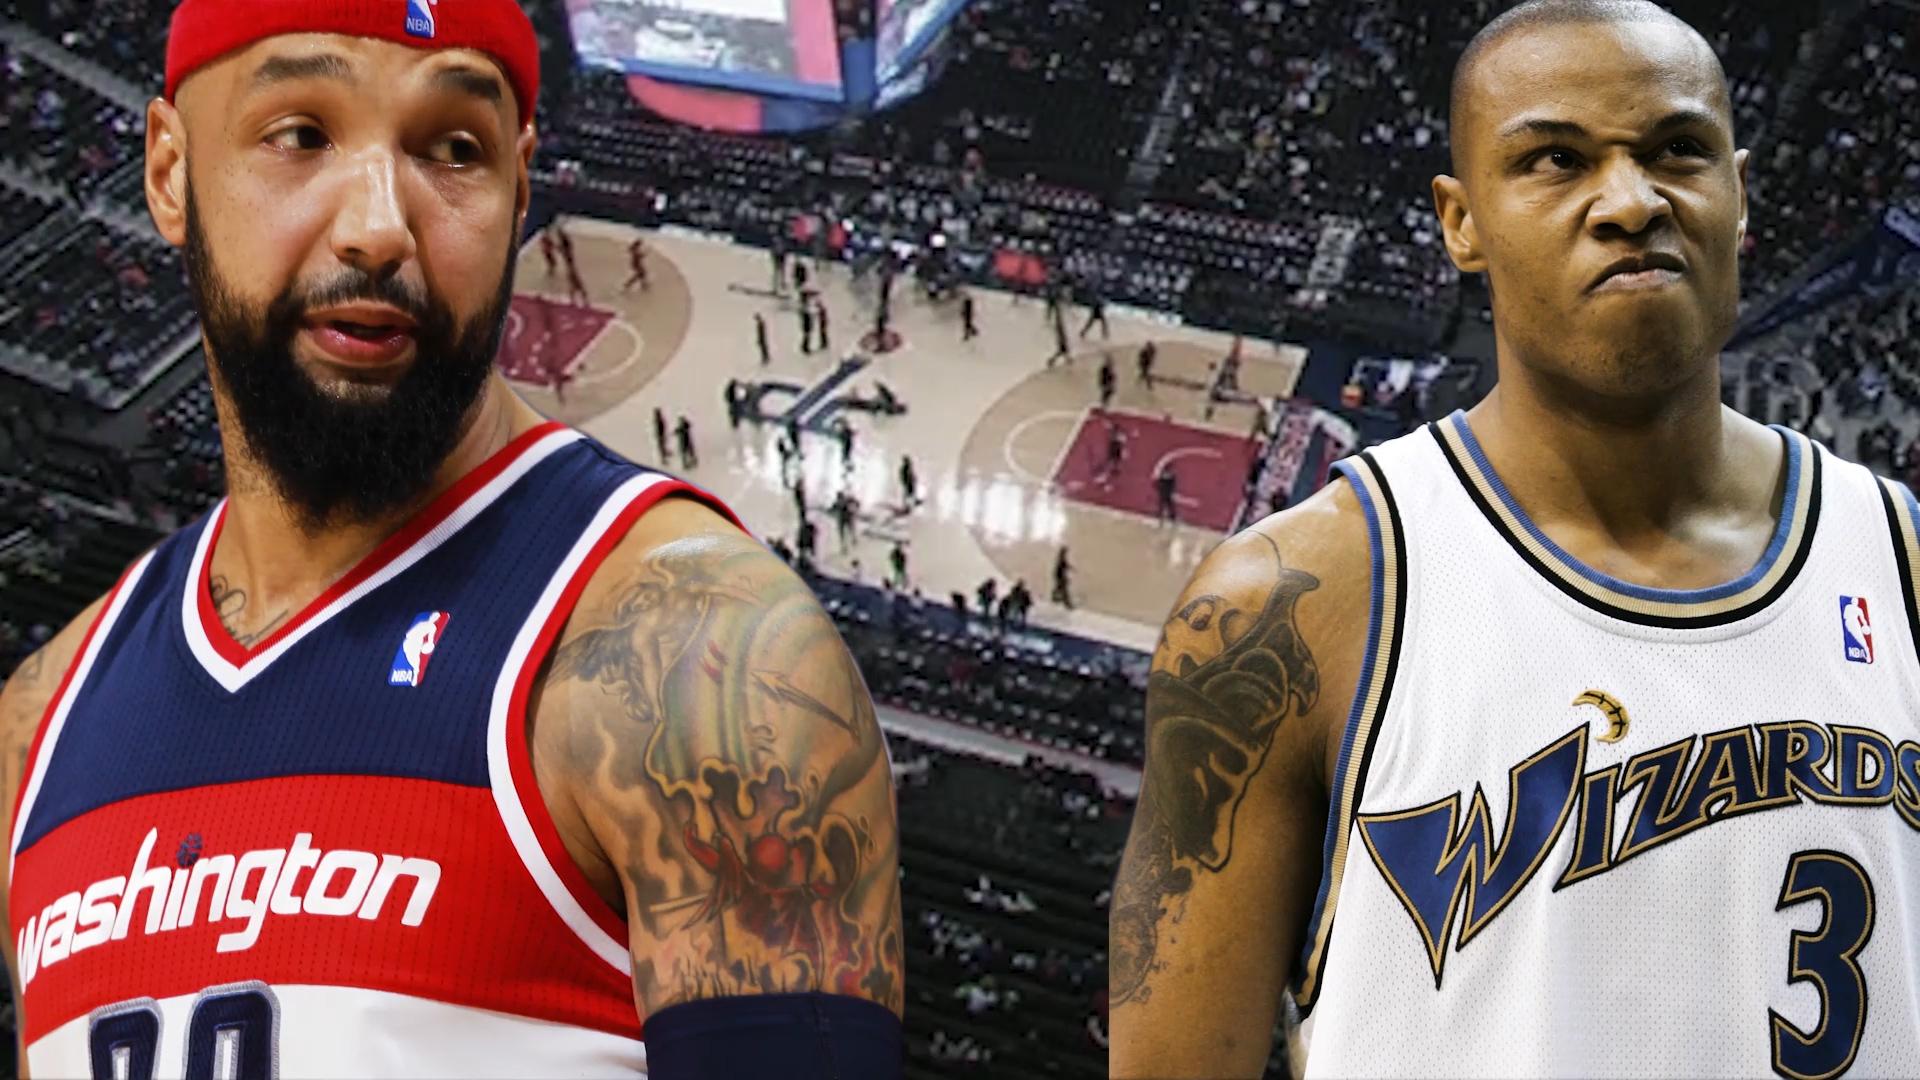 Caron Butler and Drew Gooden team up for the Washington Wizards